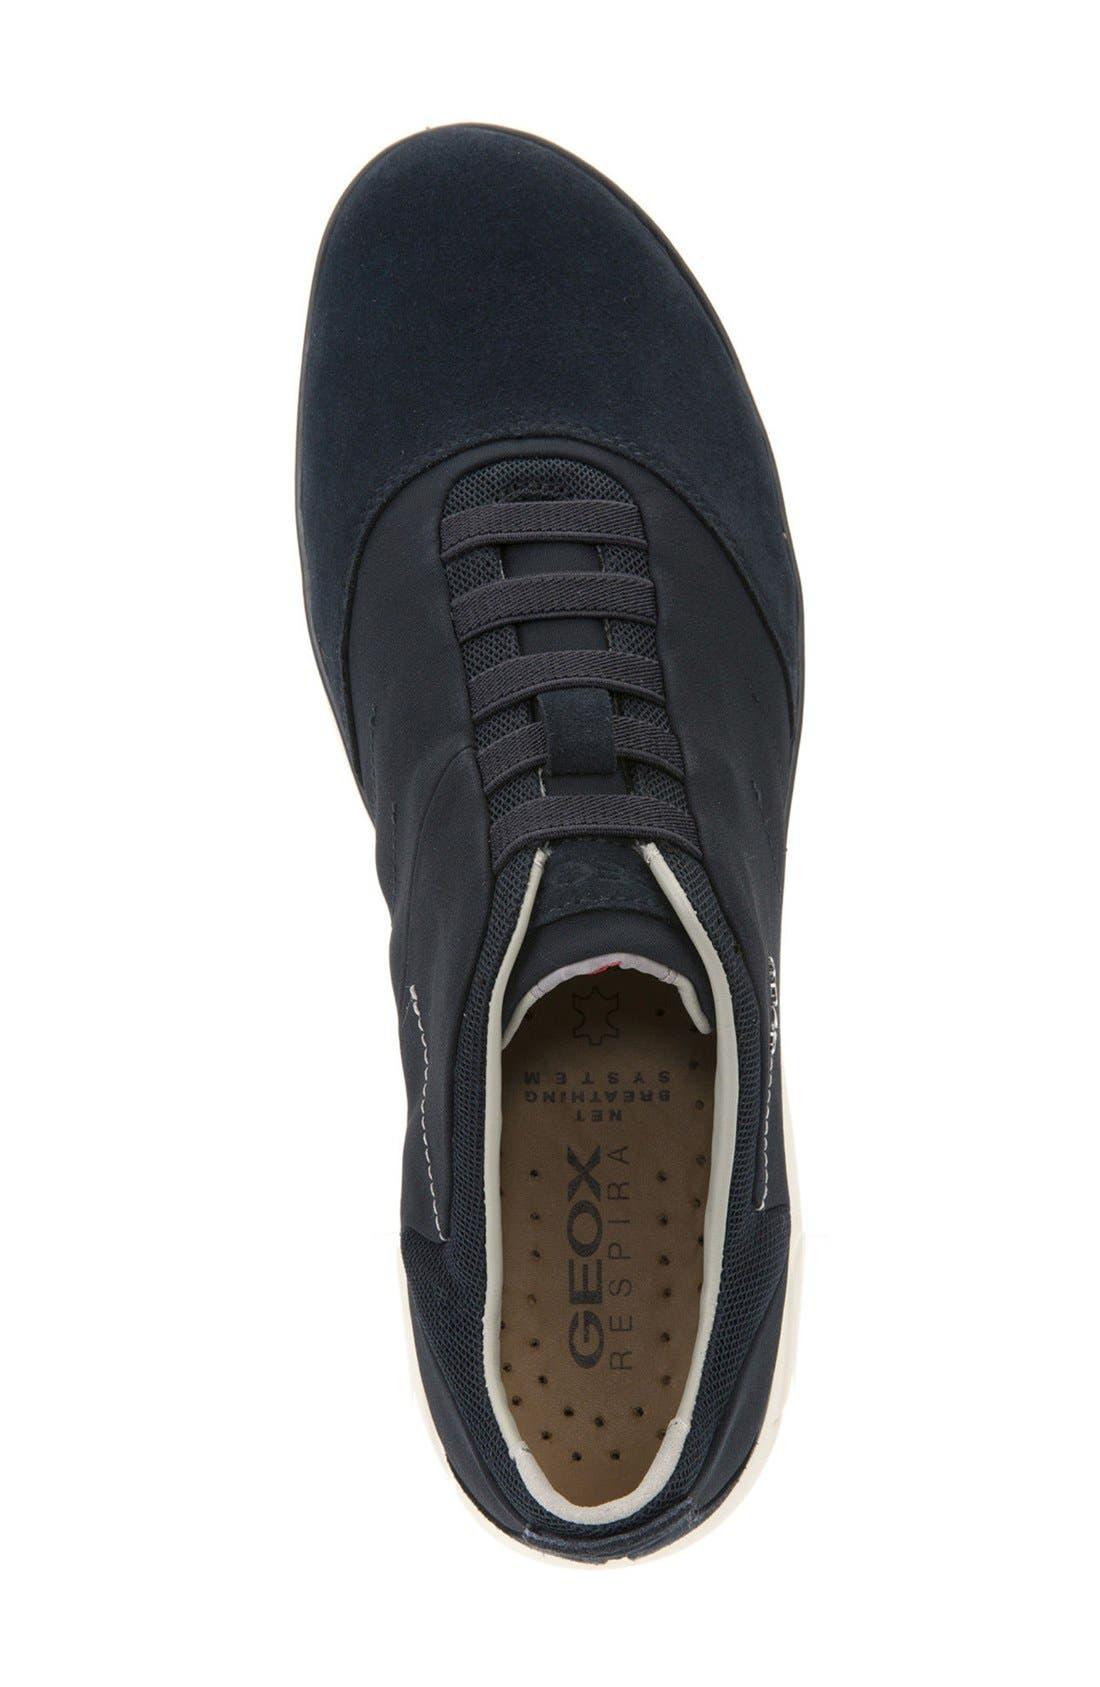 Nebula10 Slip-On Sneaker,                             Alternate thumbnail 3, color,                             NAVY SUEDE